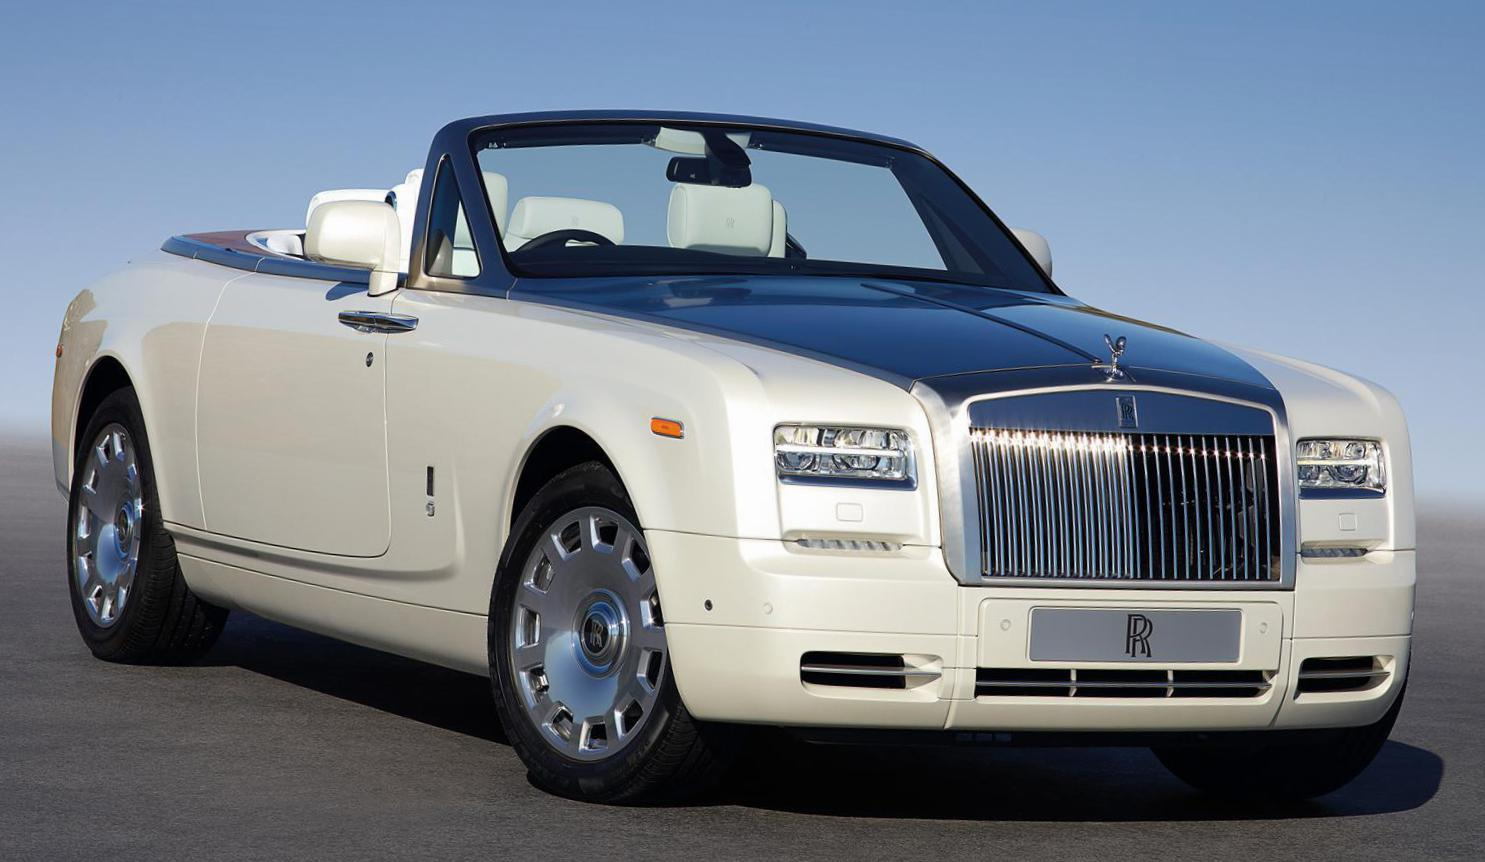 Phantom Rolls Royce Cost Suv